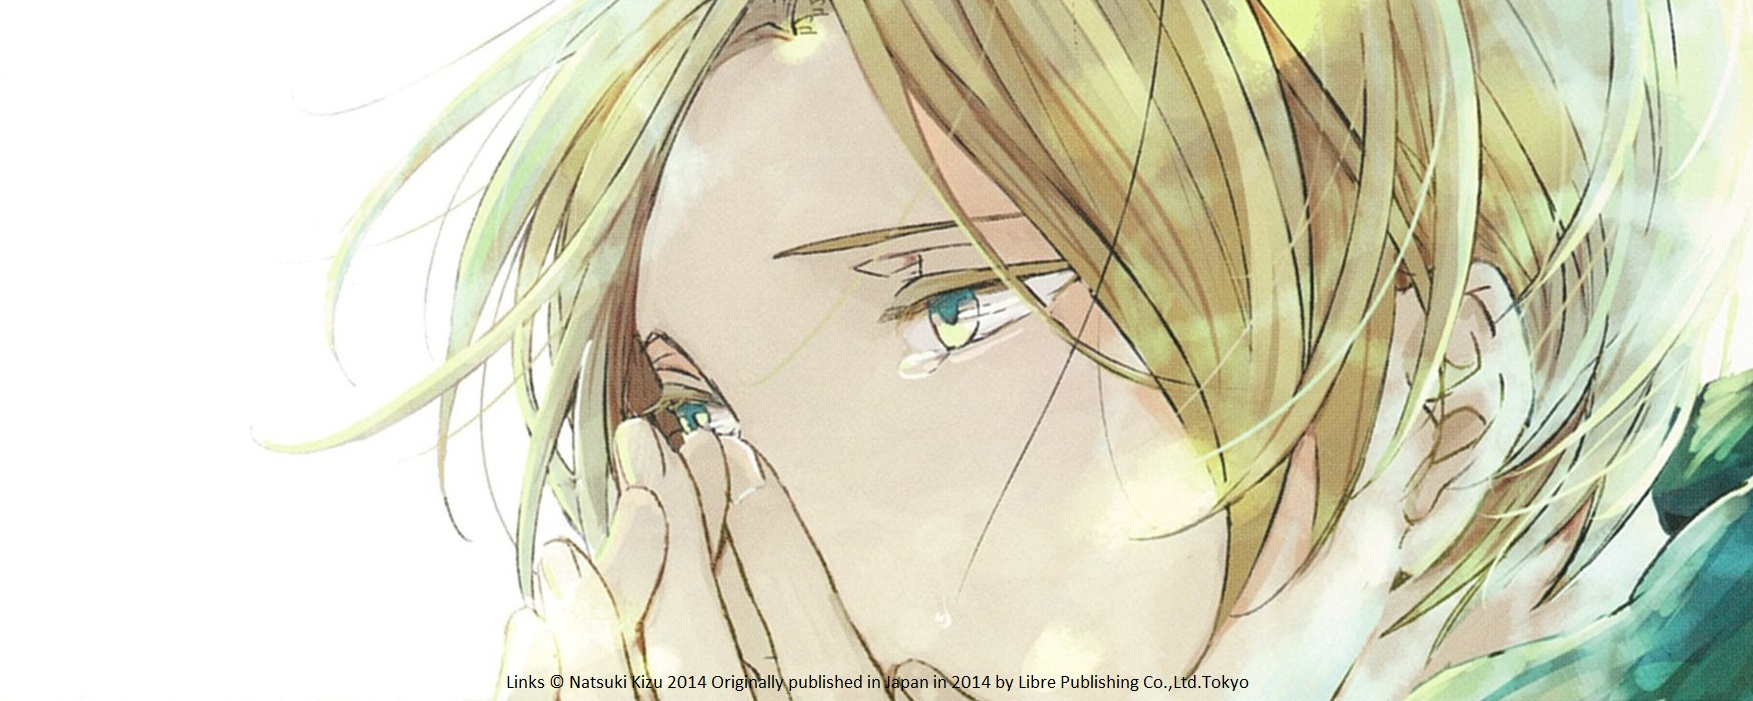 Flashbook annuncia il manga links